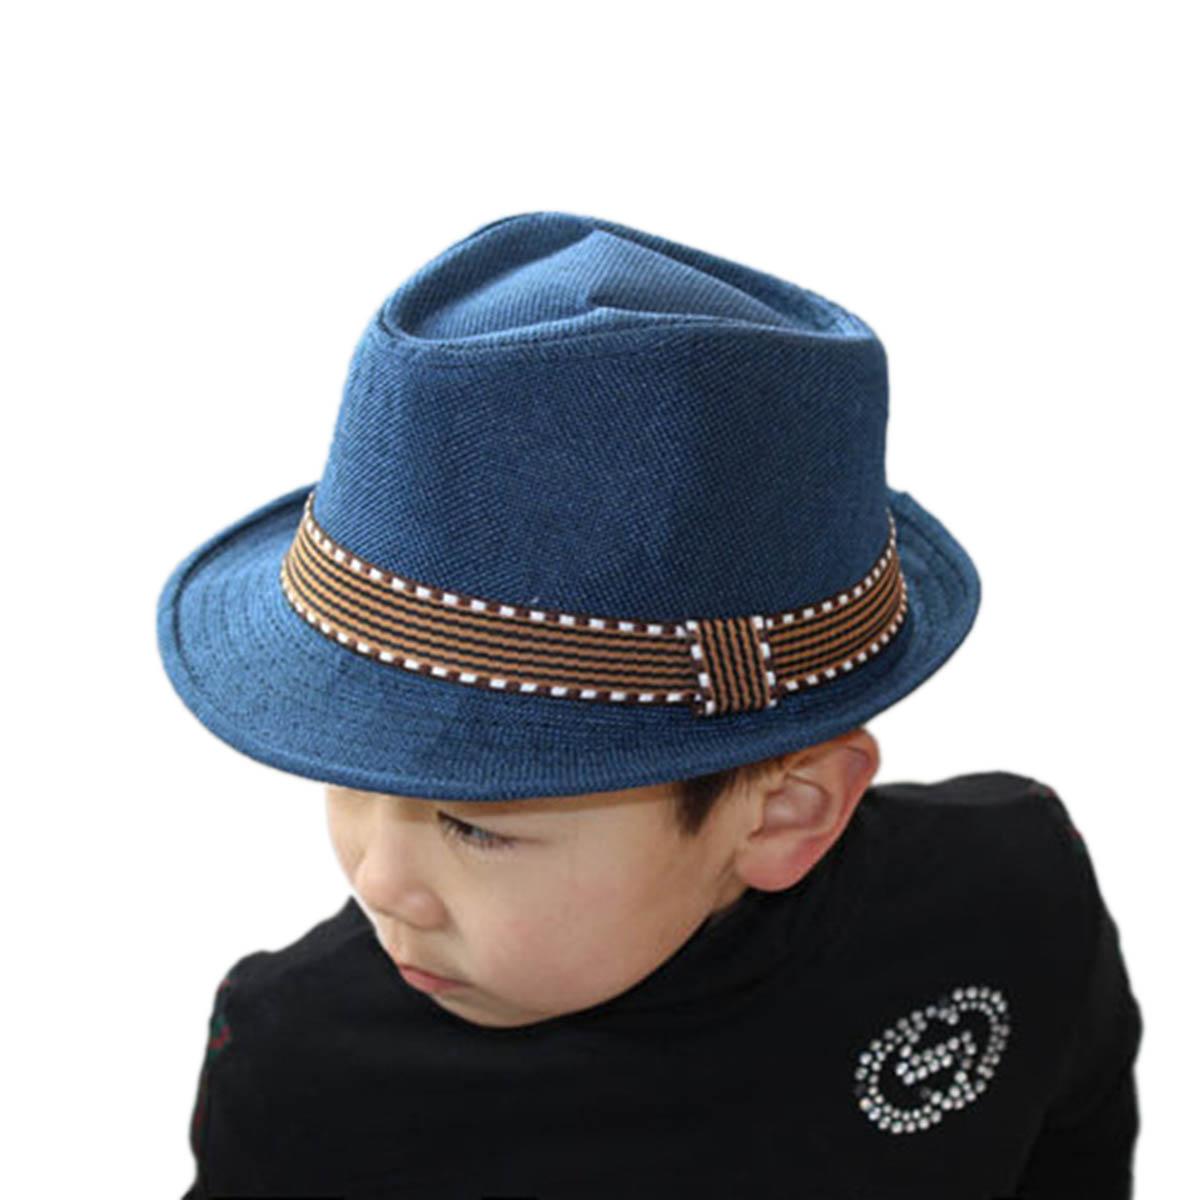 43a02aca0 Details about Baby Boys Cool Hat Beach Sun Straw Cap Toddler Infant Kids  Jazz Cap Dance Caps